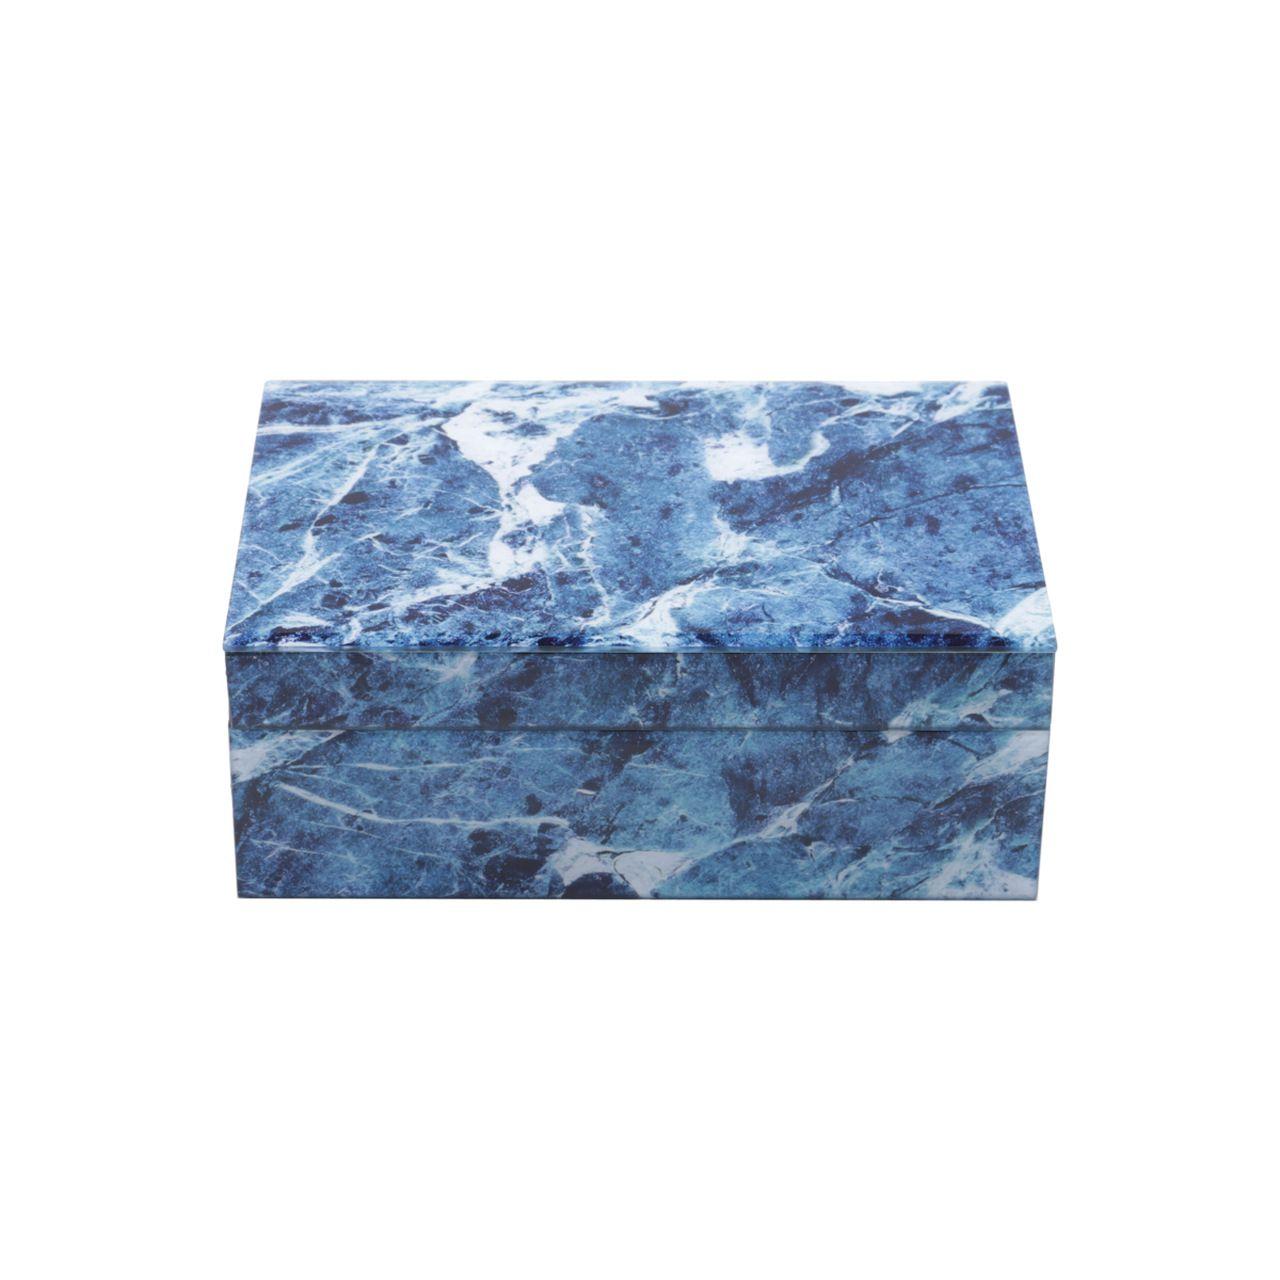 Porta Joias de Vidro Mármore 24,5x17,5x9cm